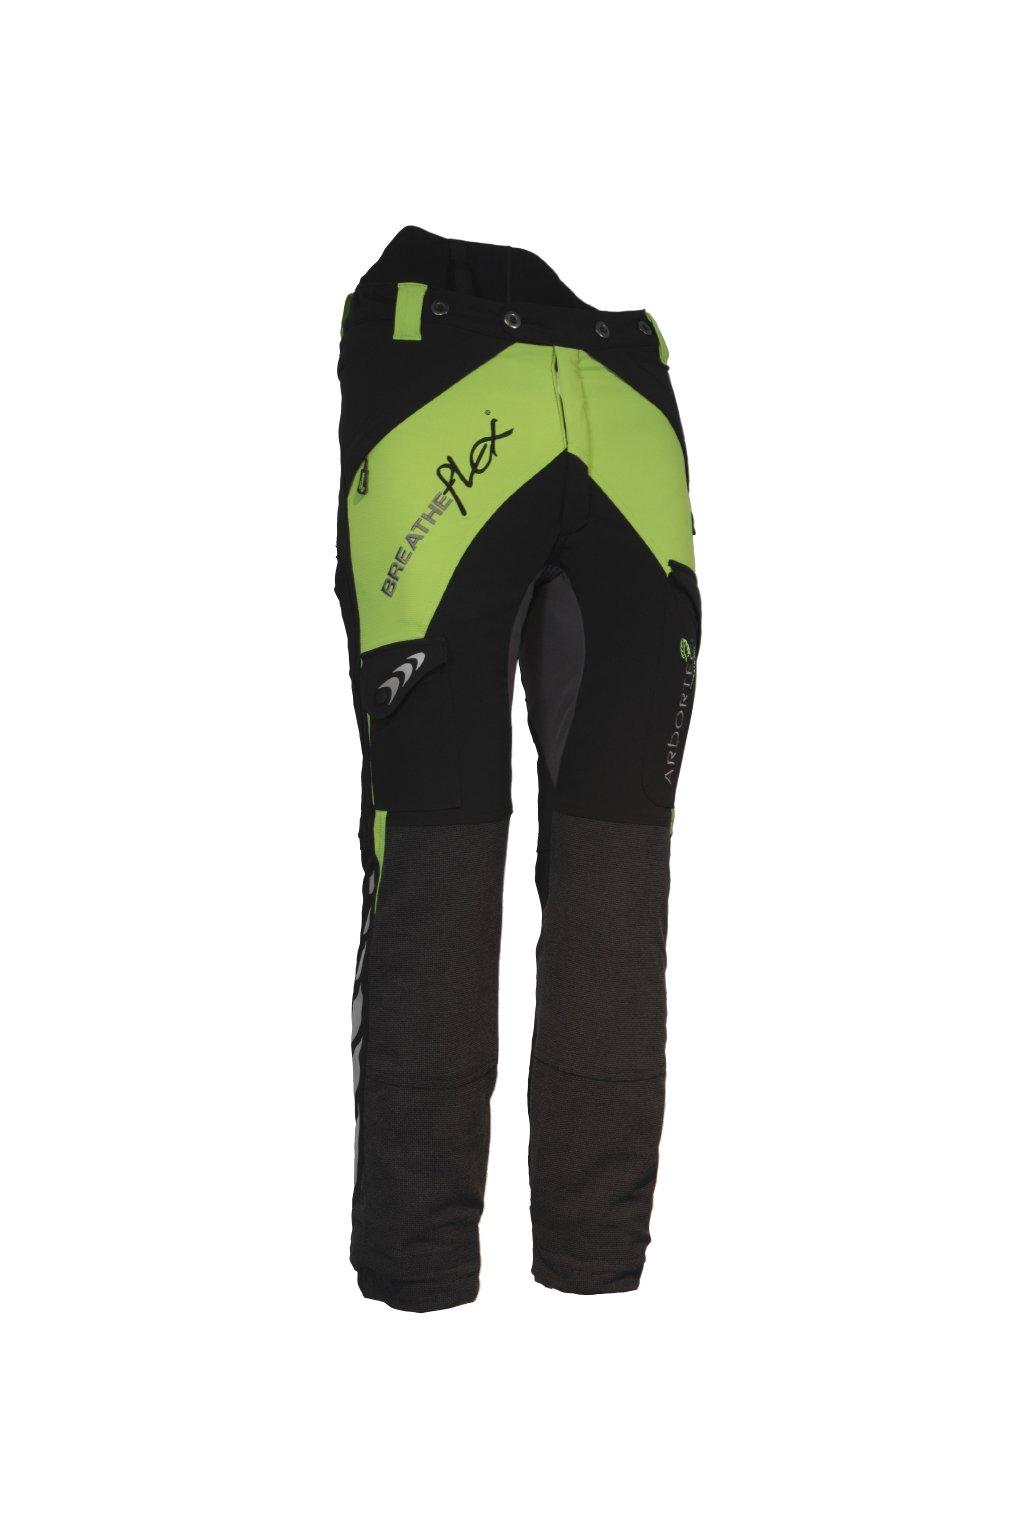 Protipořezové kalhoty Breatheflex zelené Class2/TypeC Short